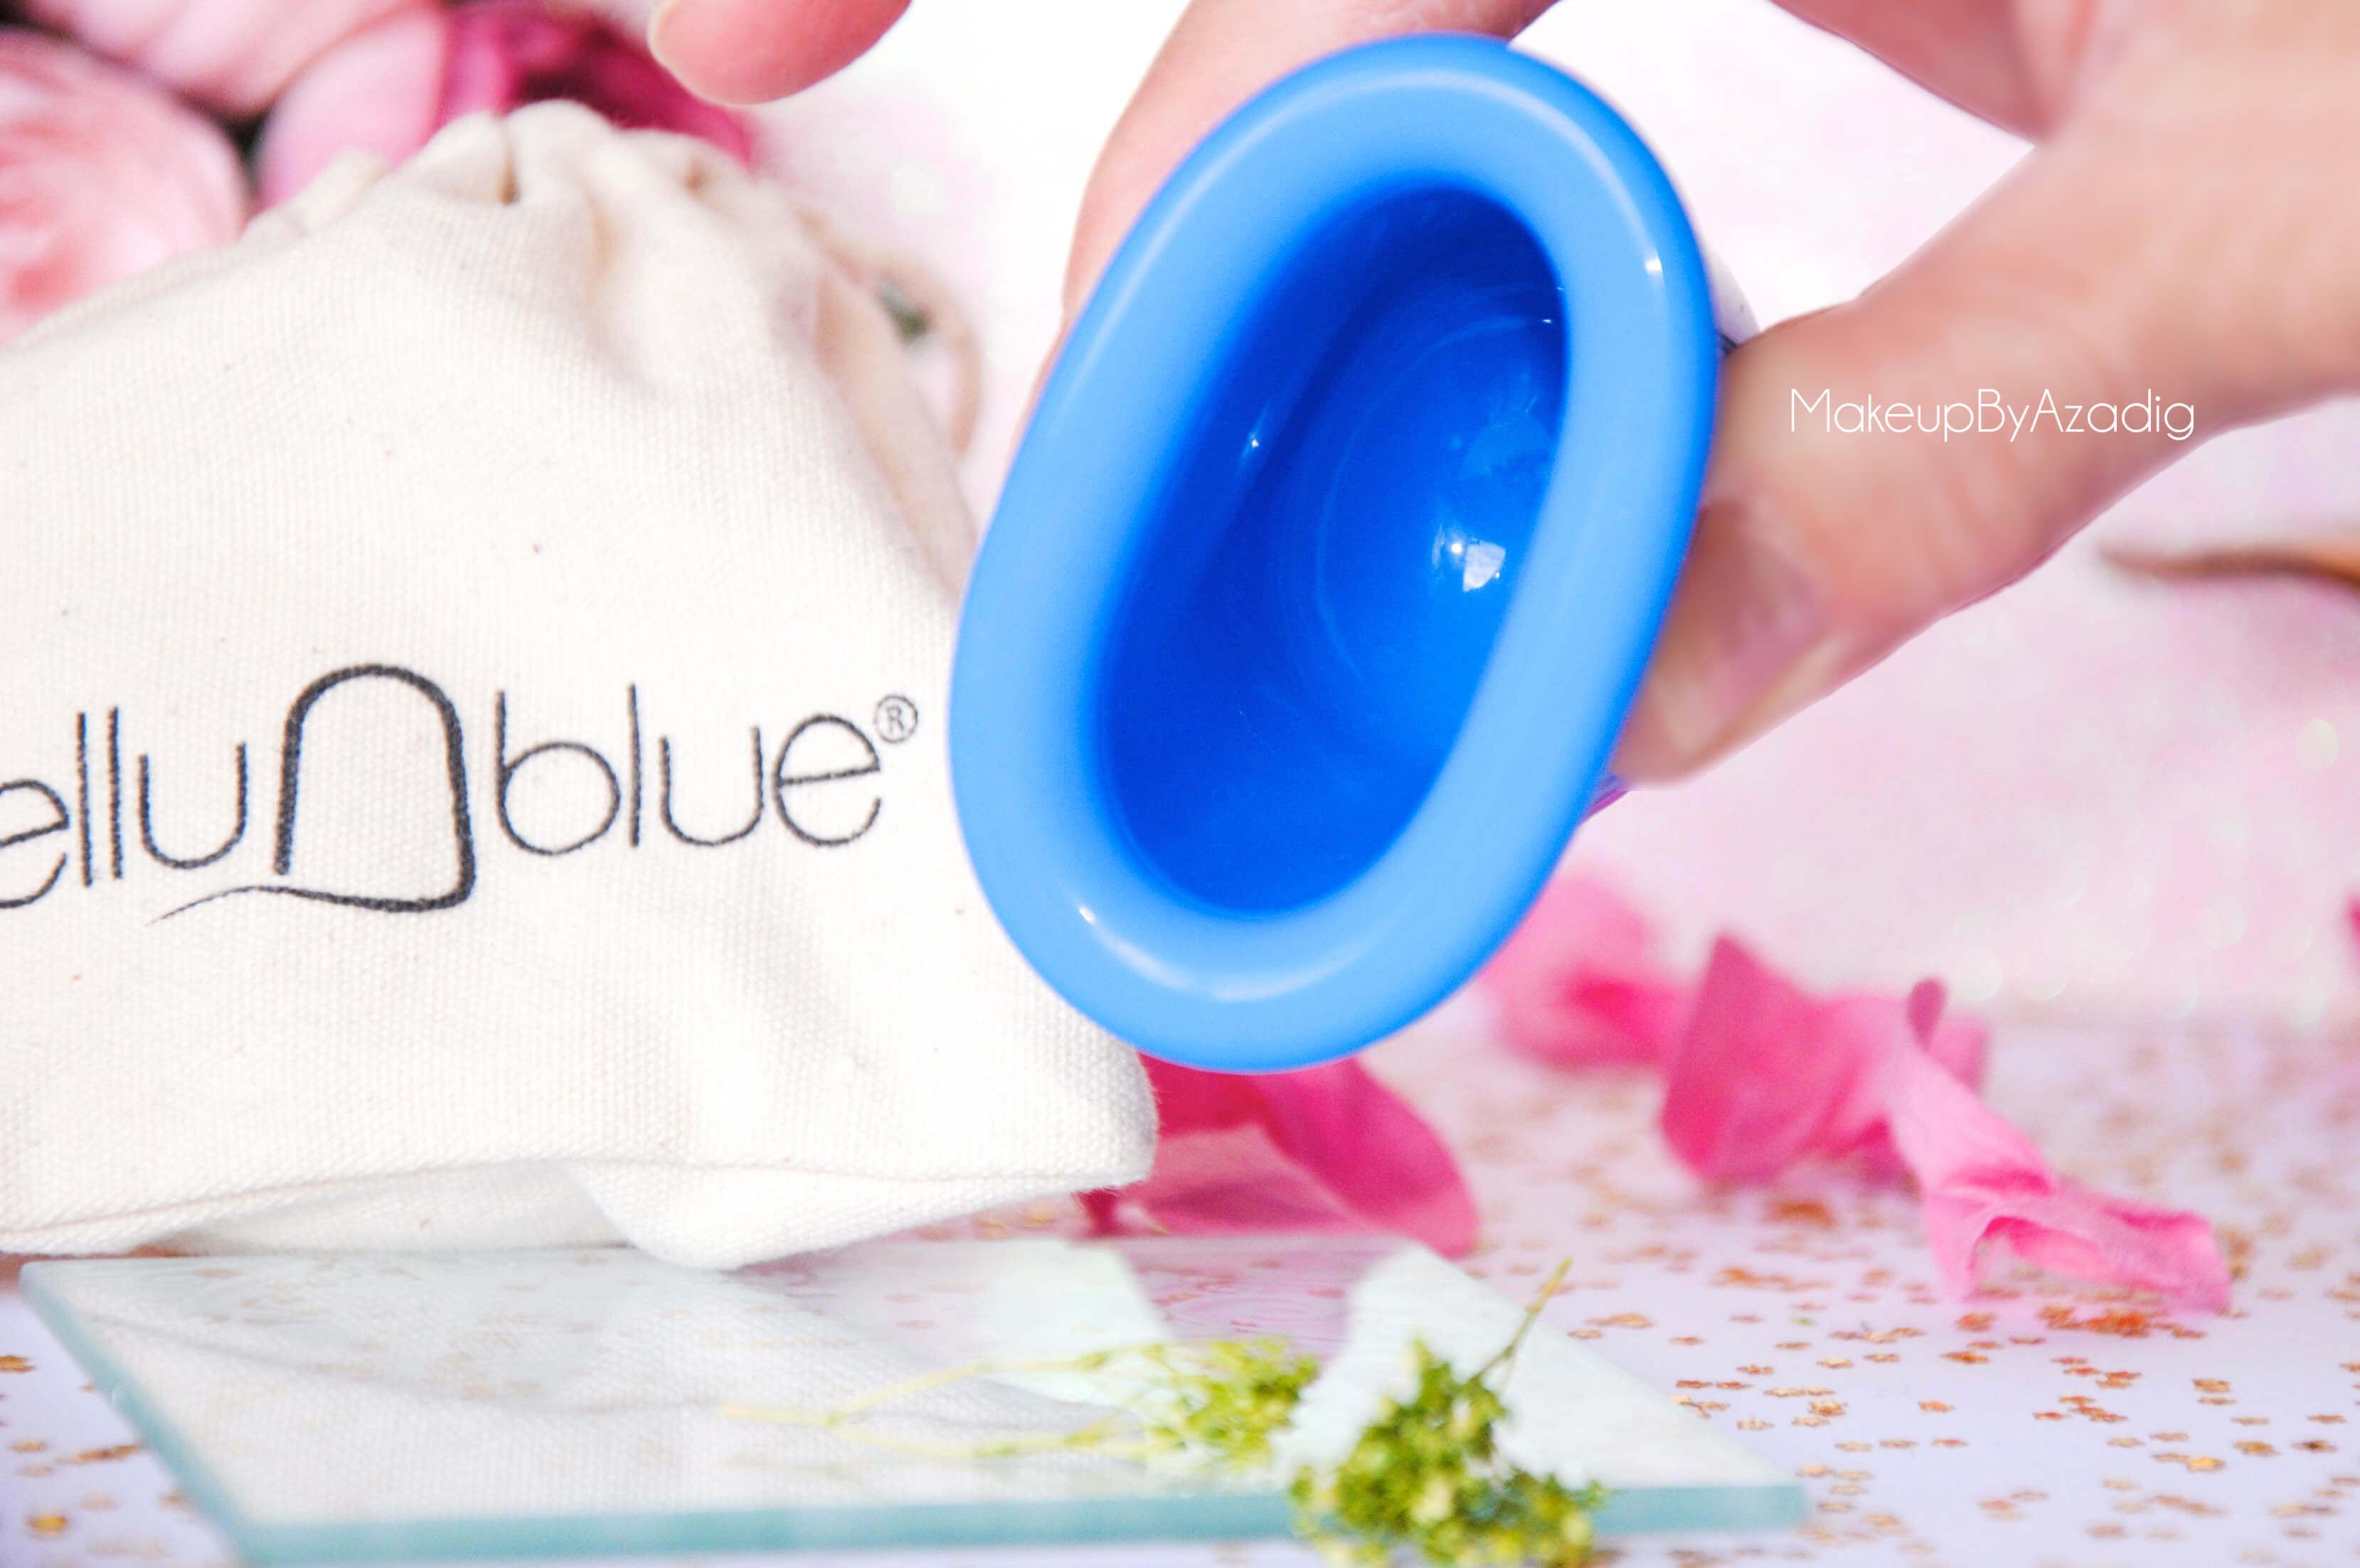 makeupbyazadig-cellublue-ventouse anti cellulite-avis-massage